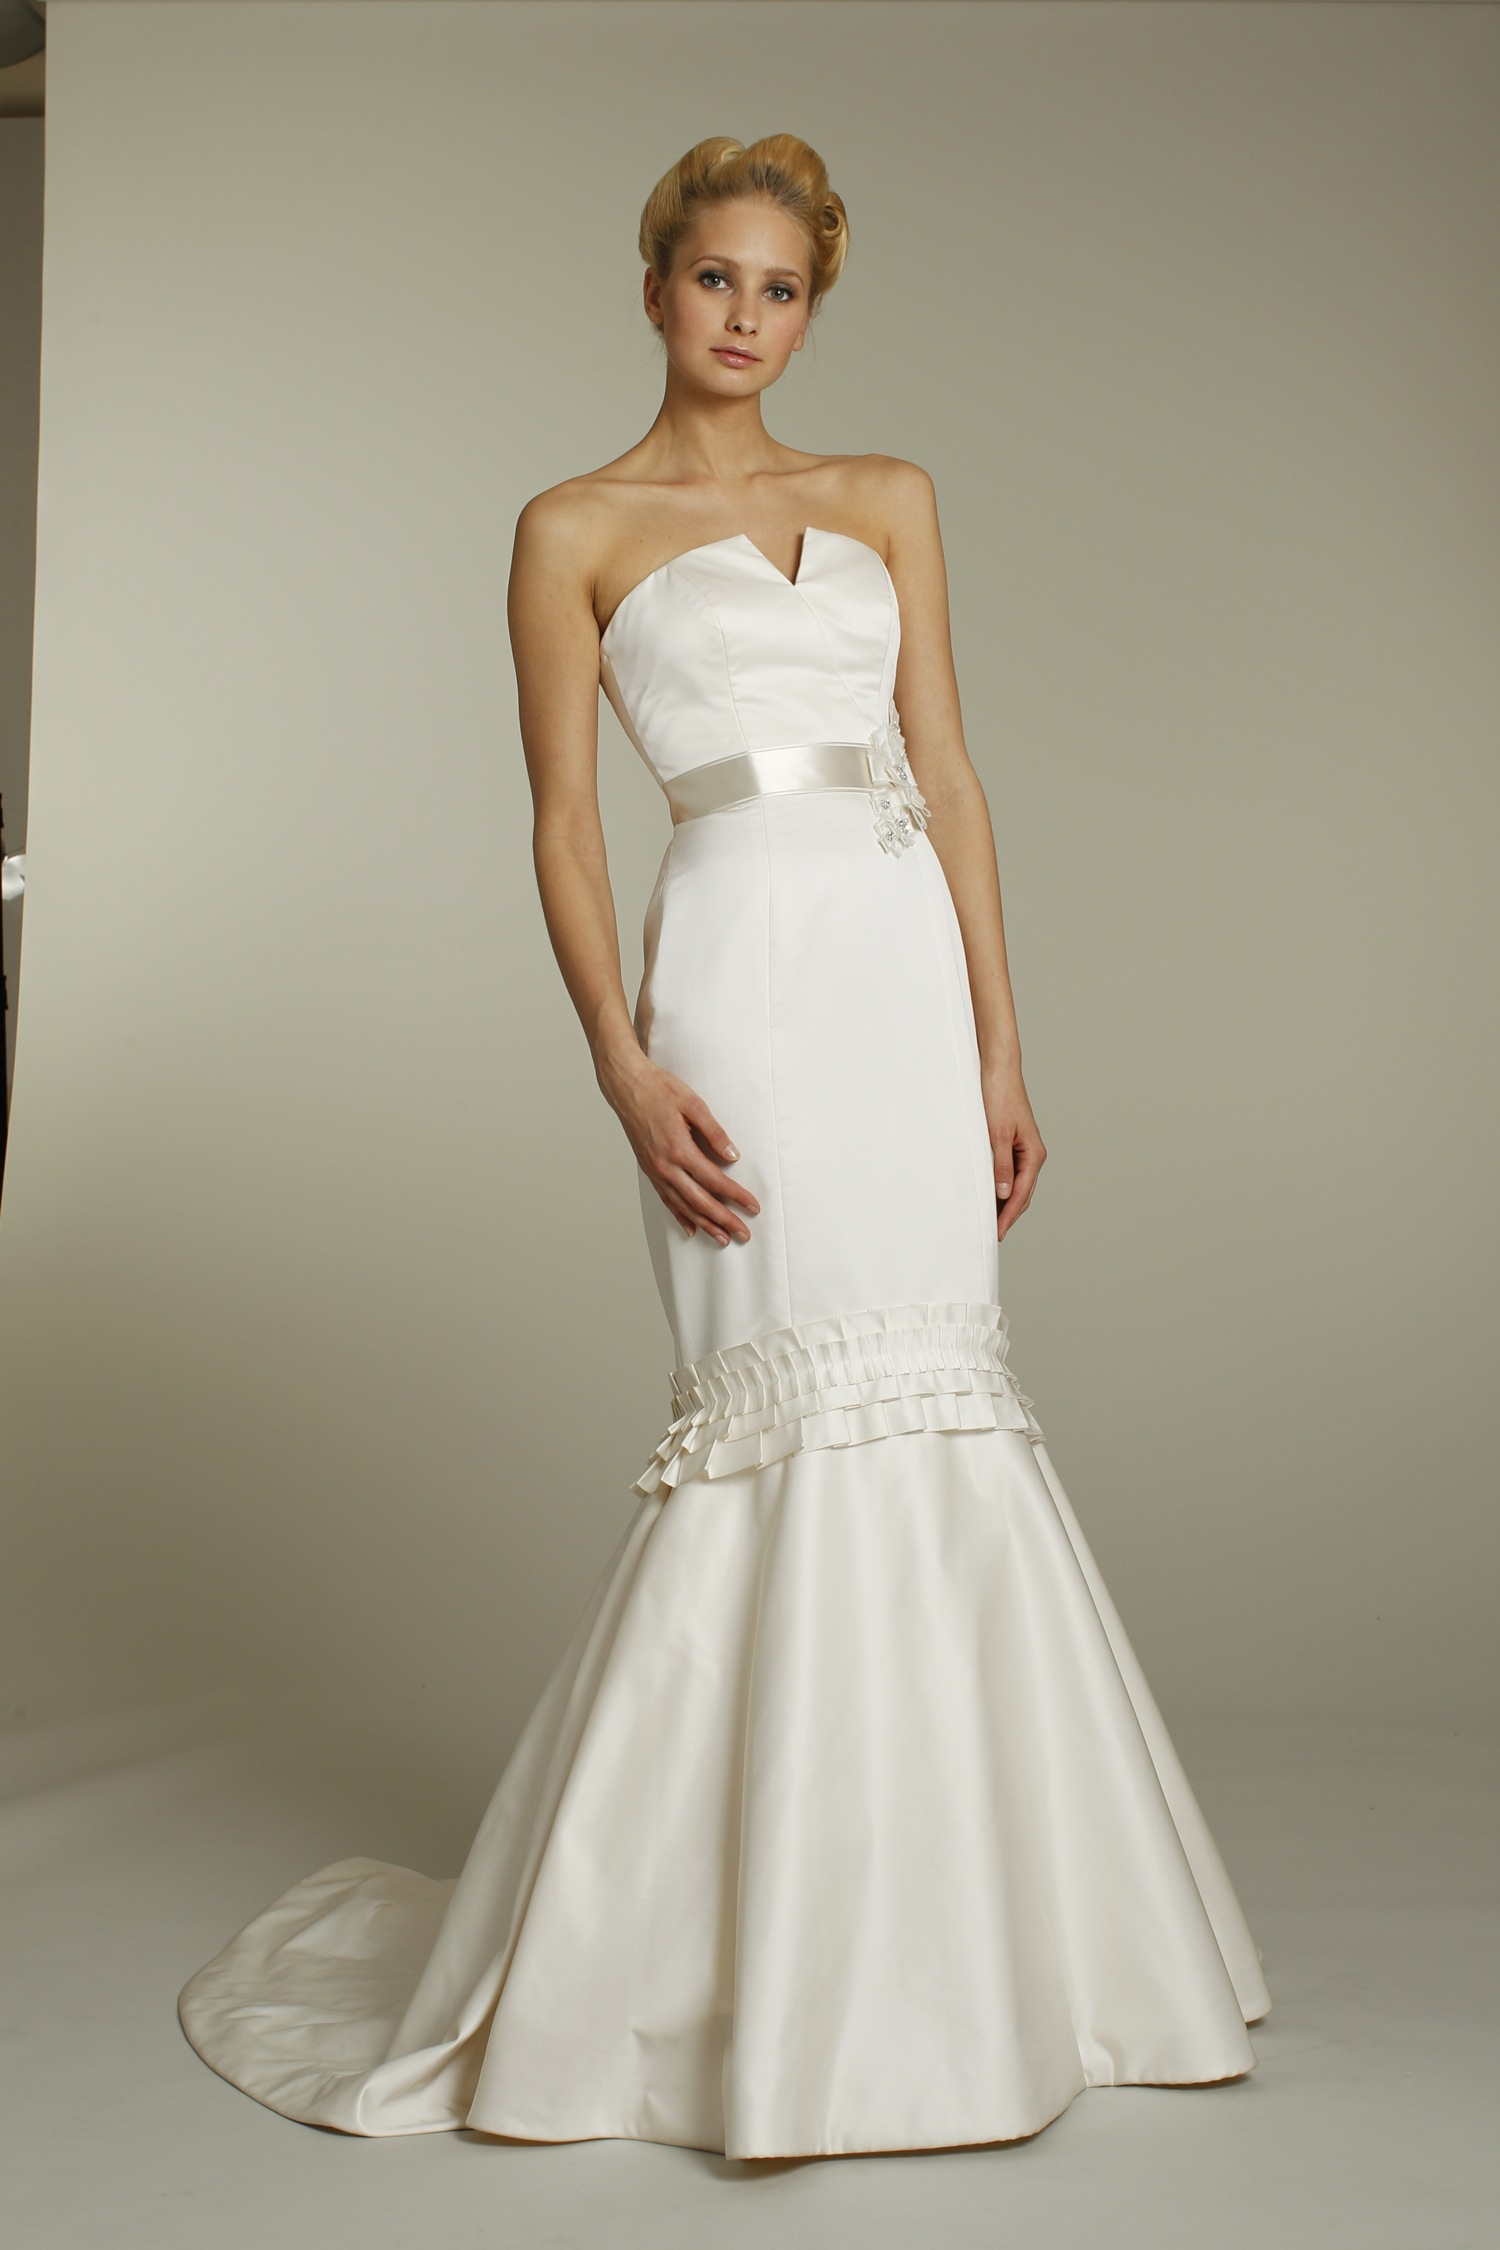 Strapless Wedding Dress With Sash